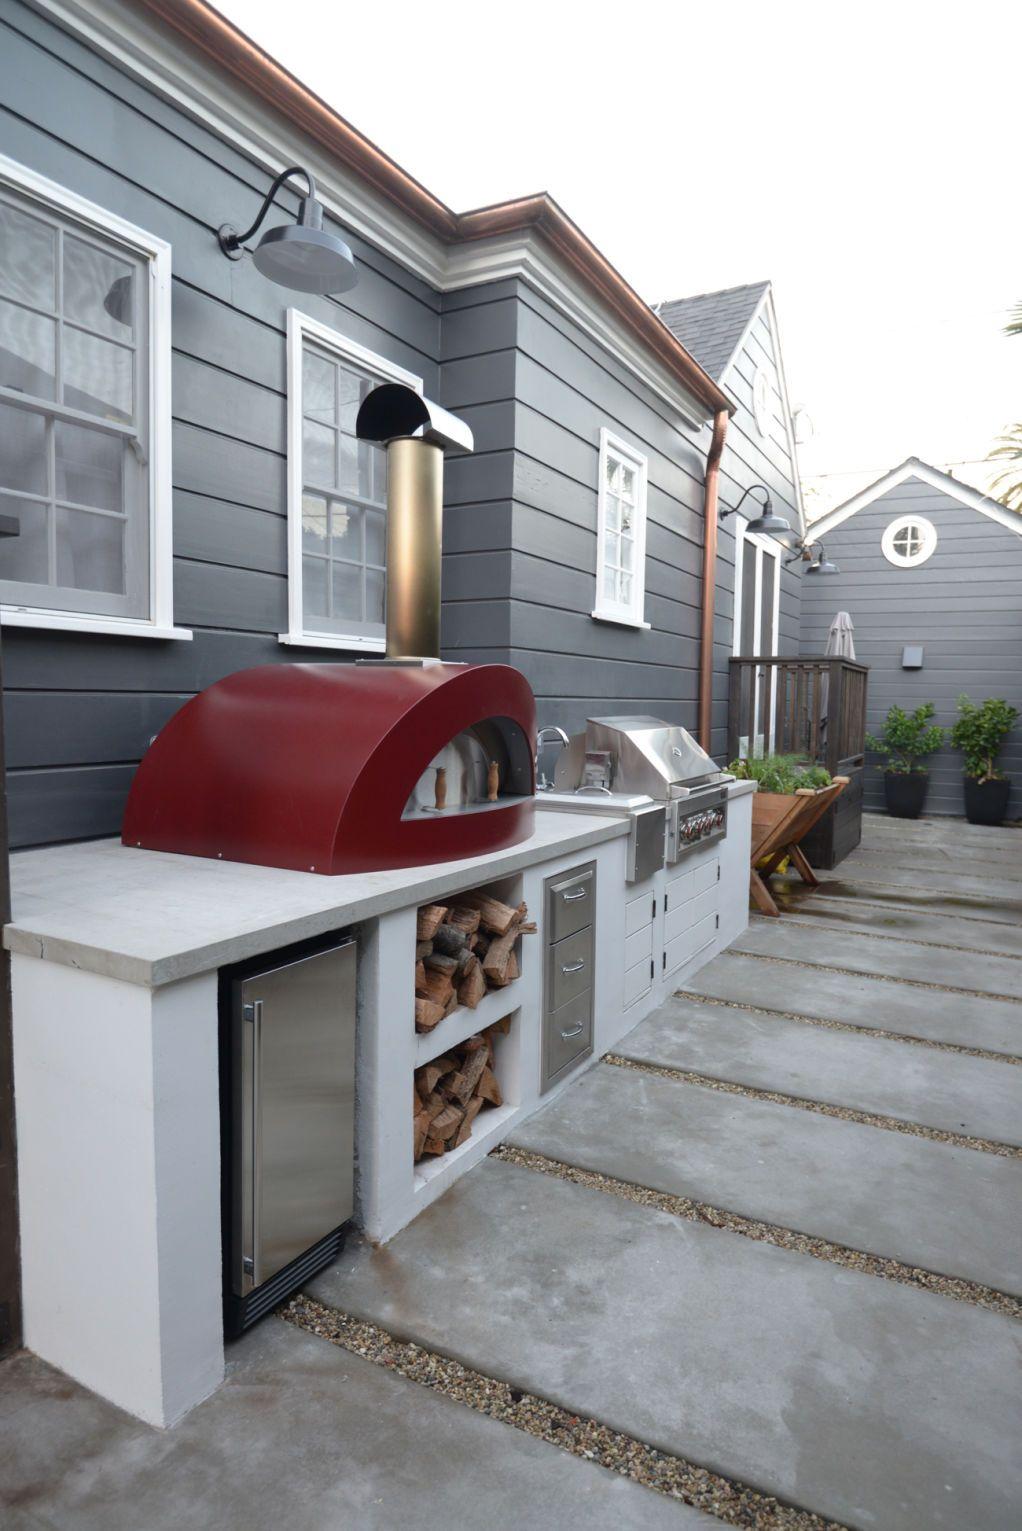 Our Outdoor Renovation Outdoor renovation, Outdoor